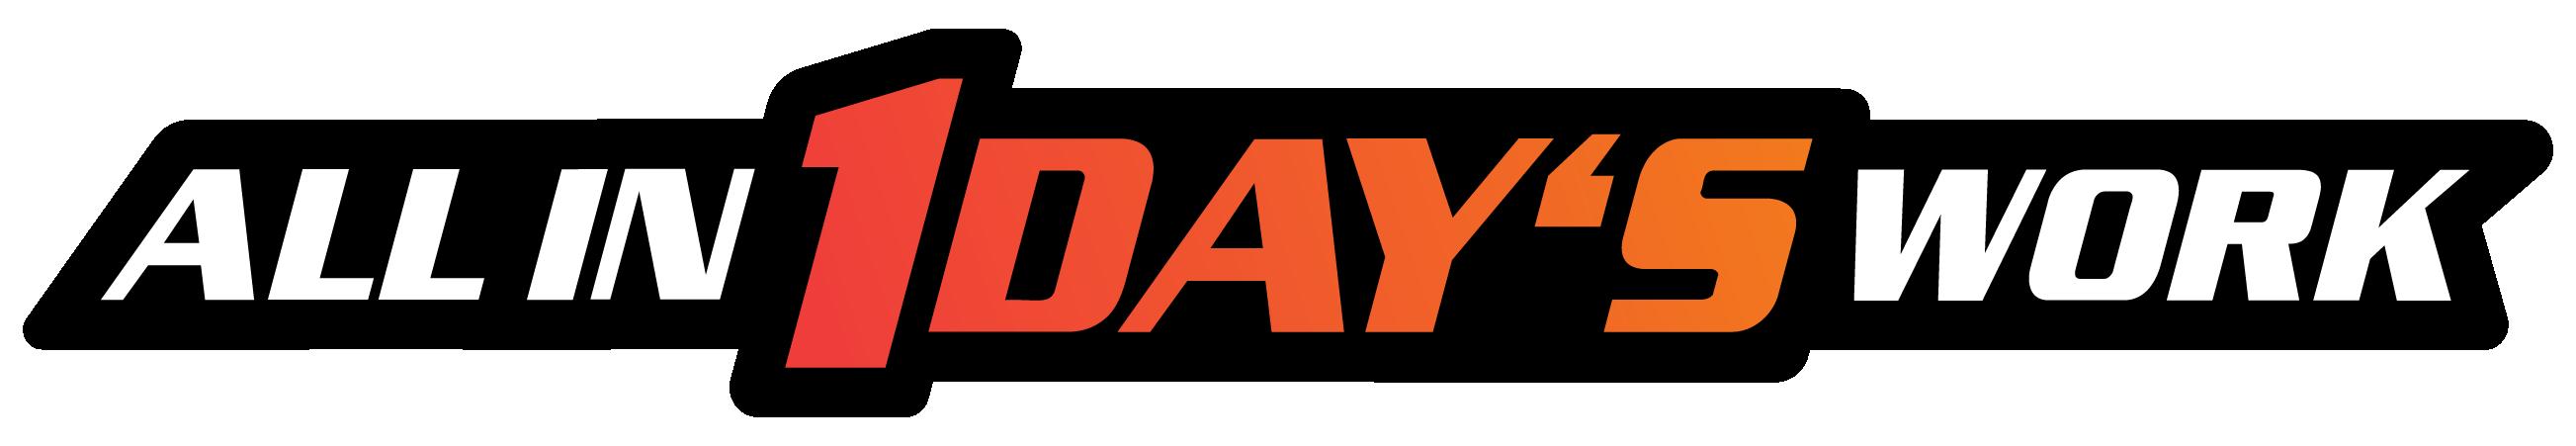 your1dayfloor.com logo 2